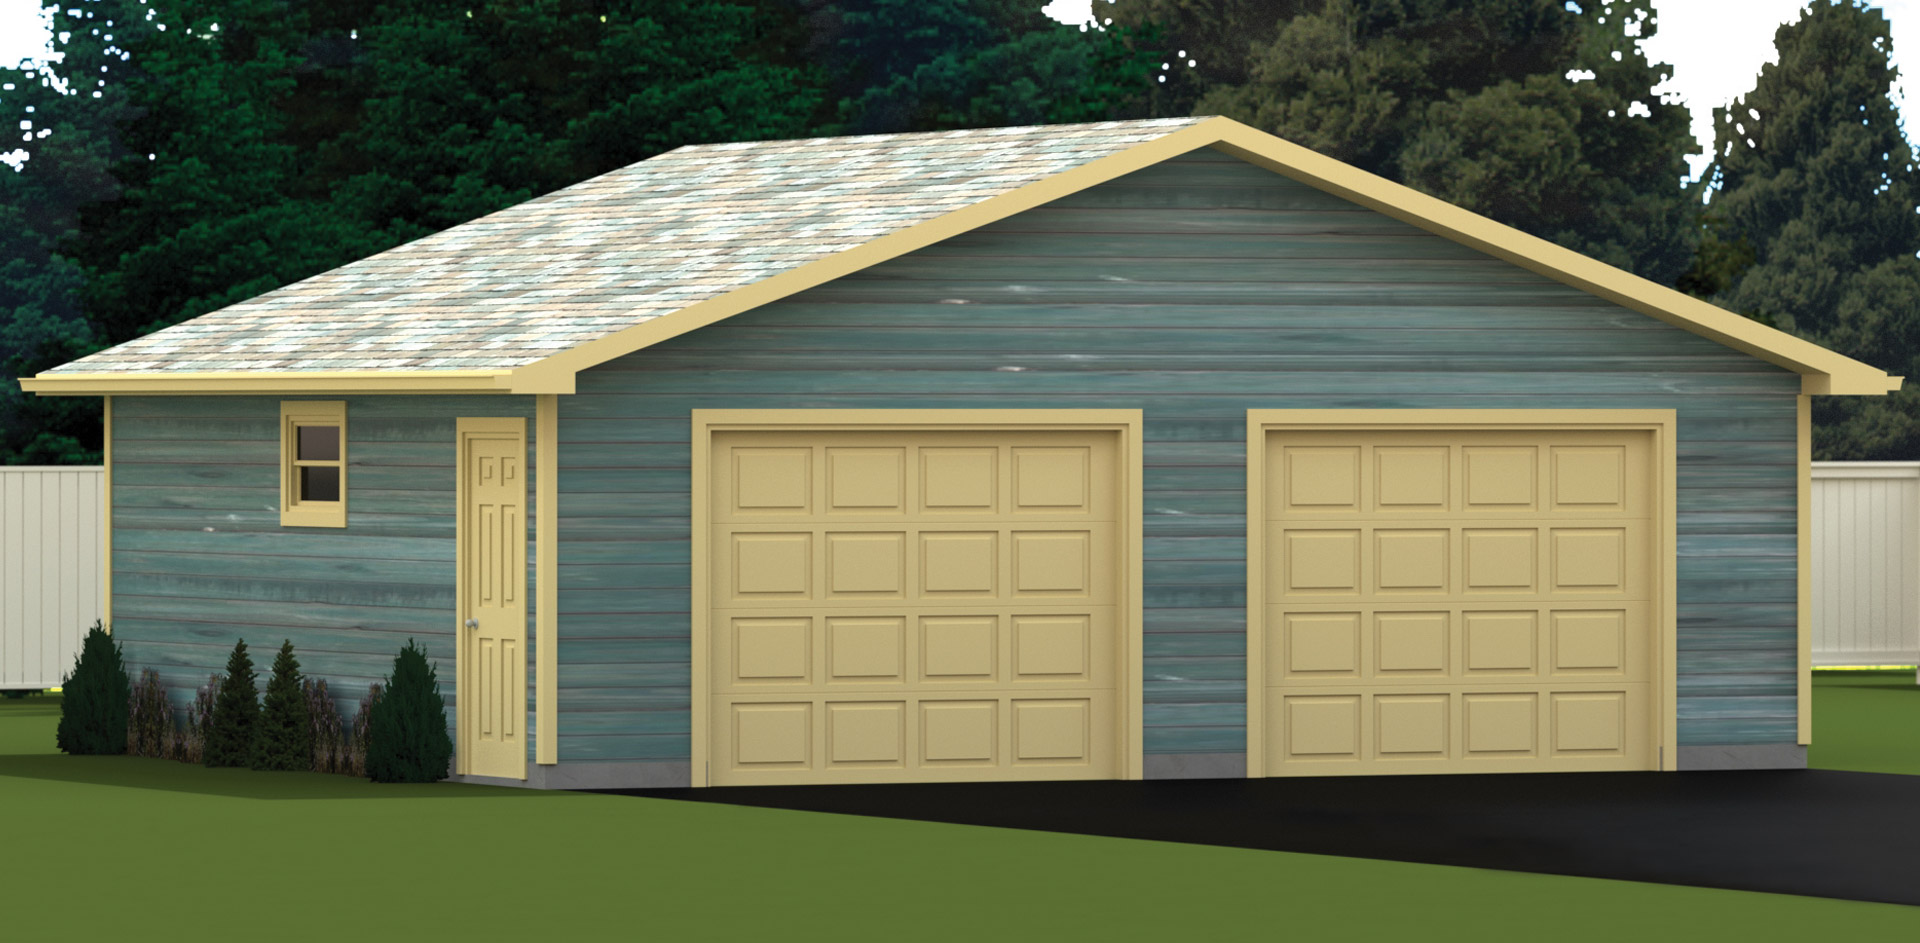 672 sq.ft. timber mart 2 car garage exterior render